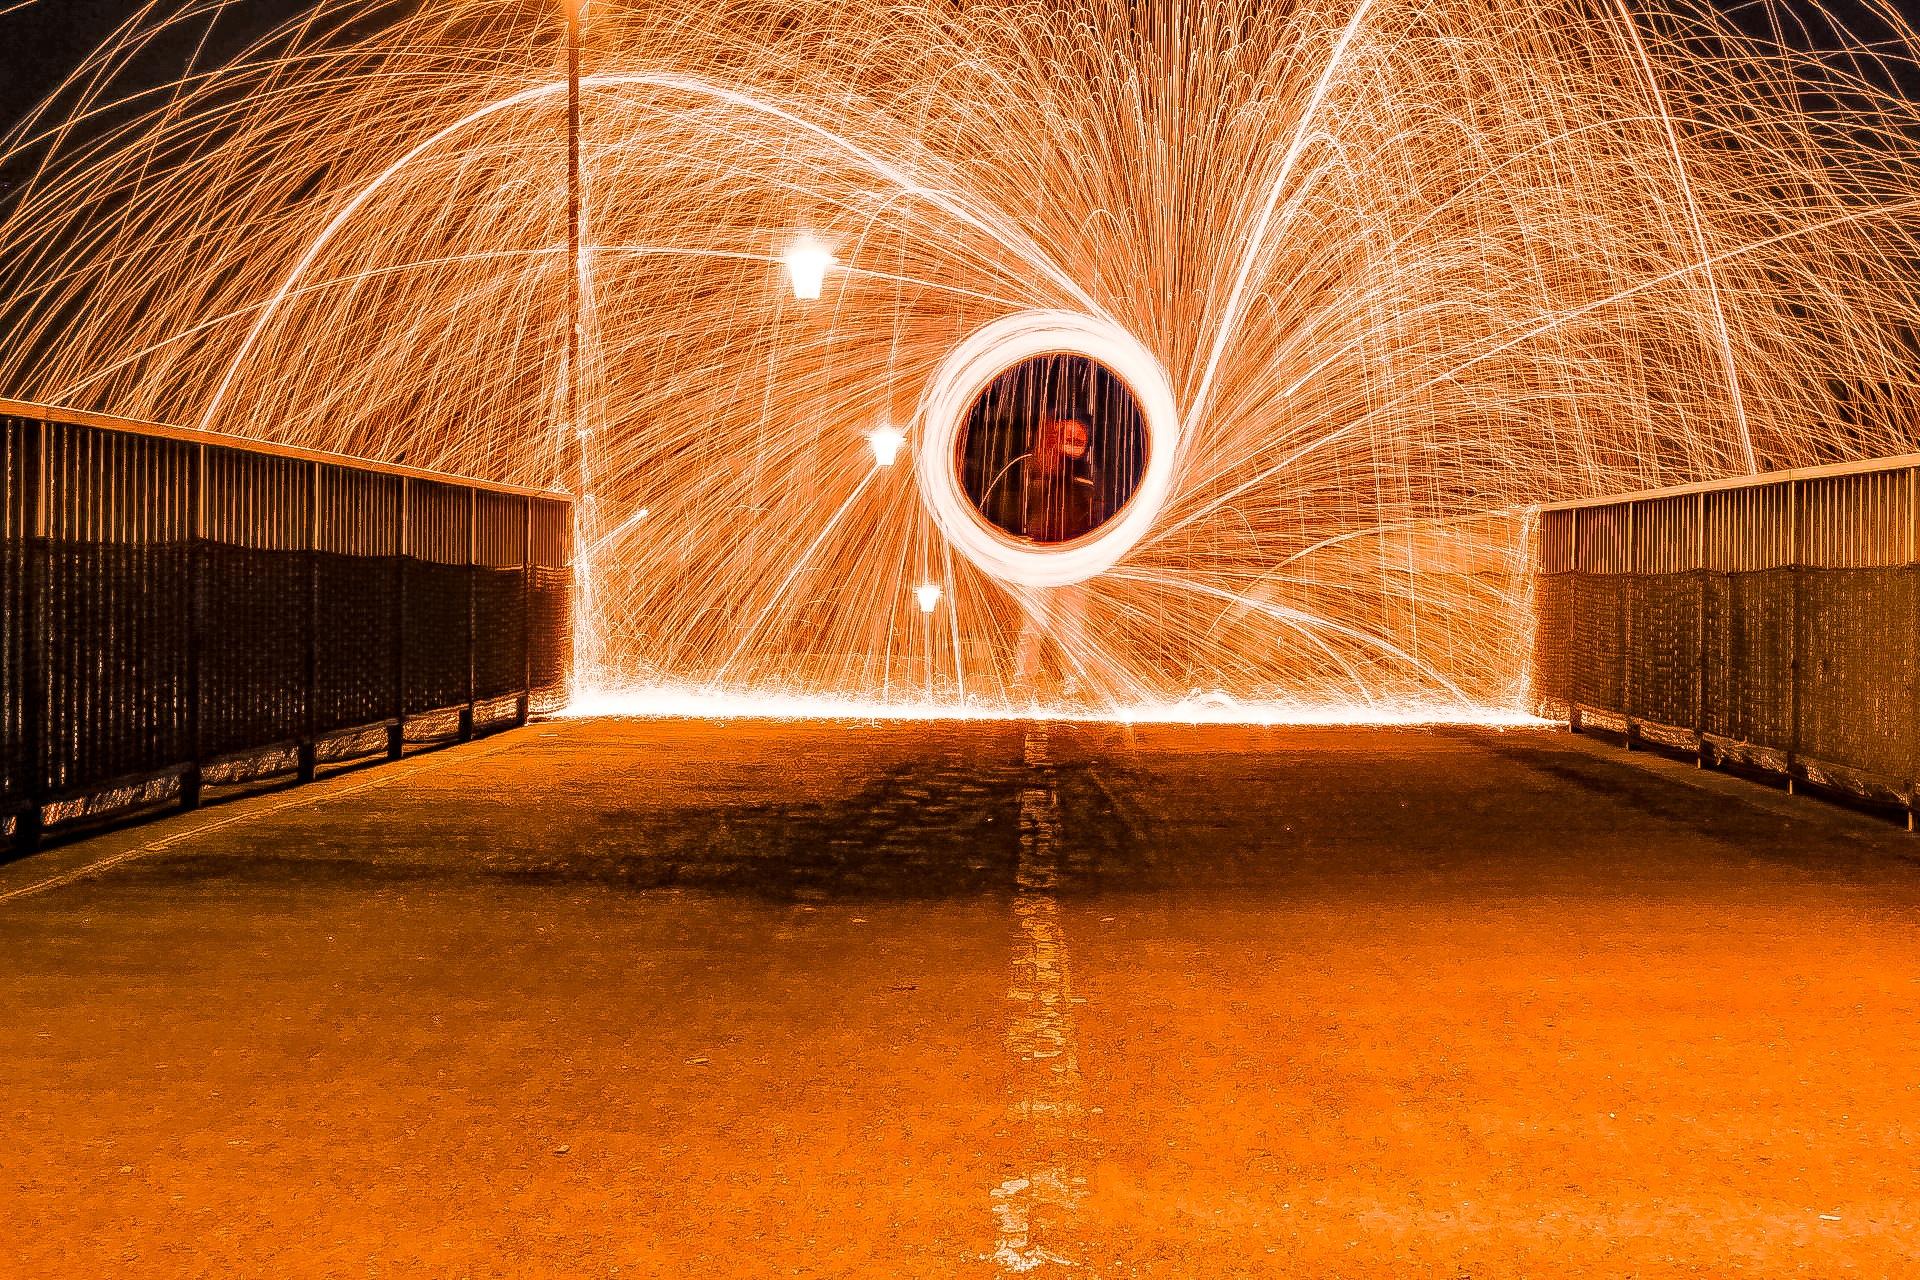 Burning Steelwool by leonbischoff77